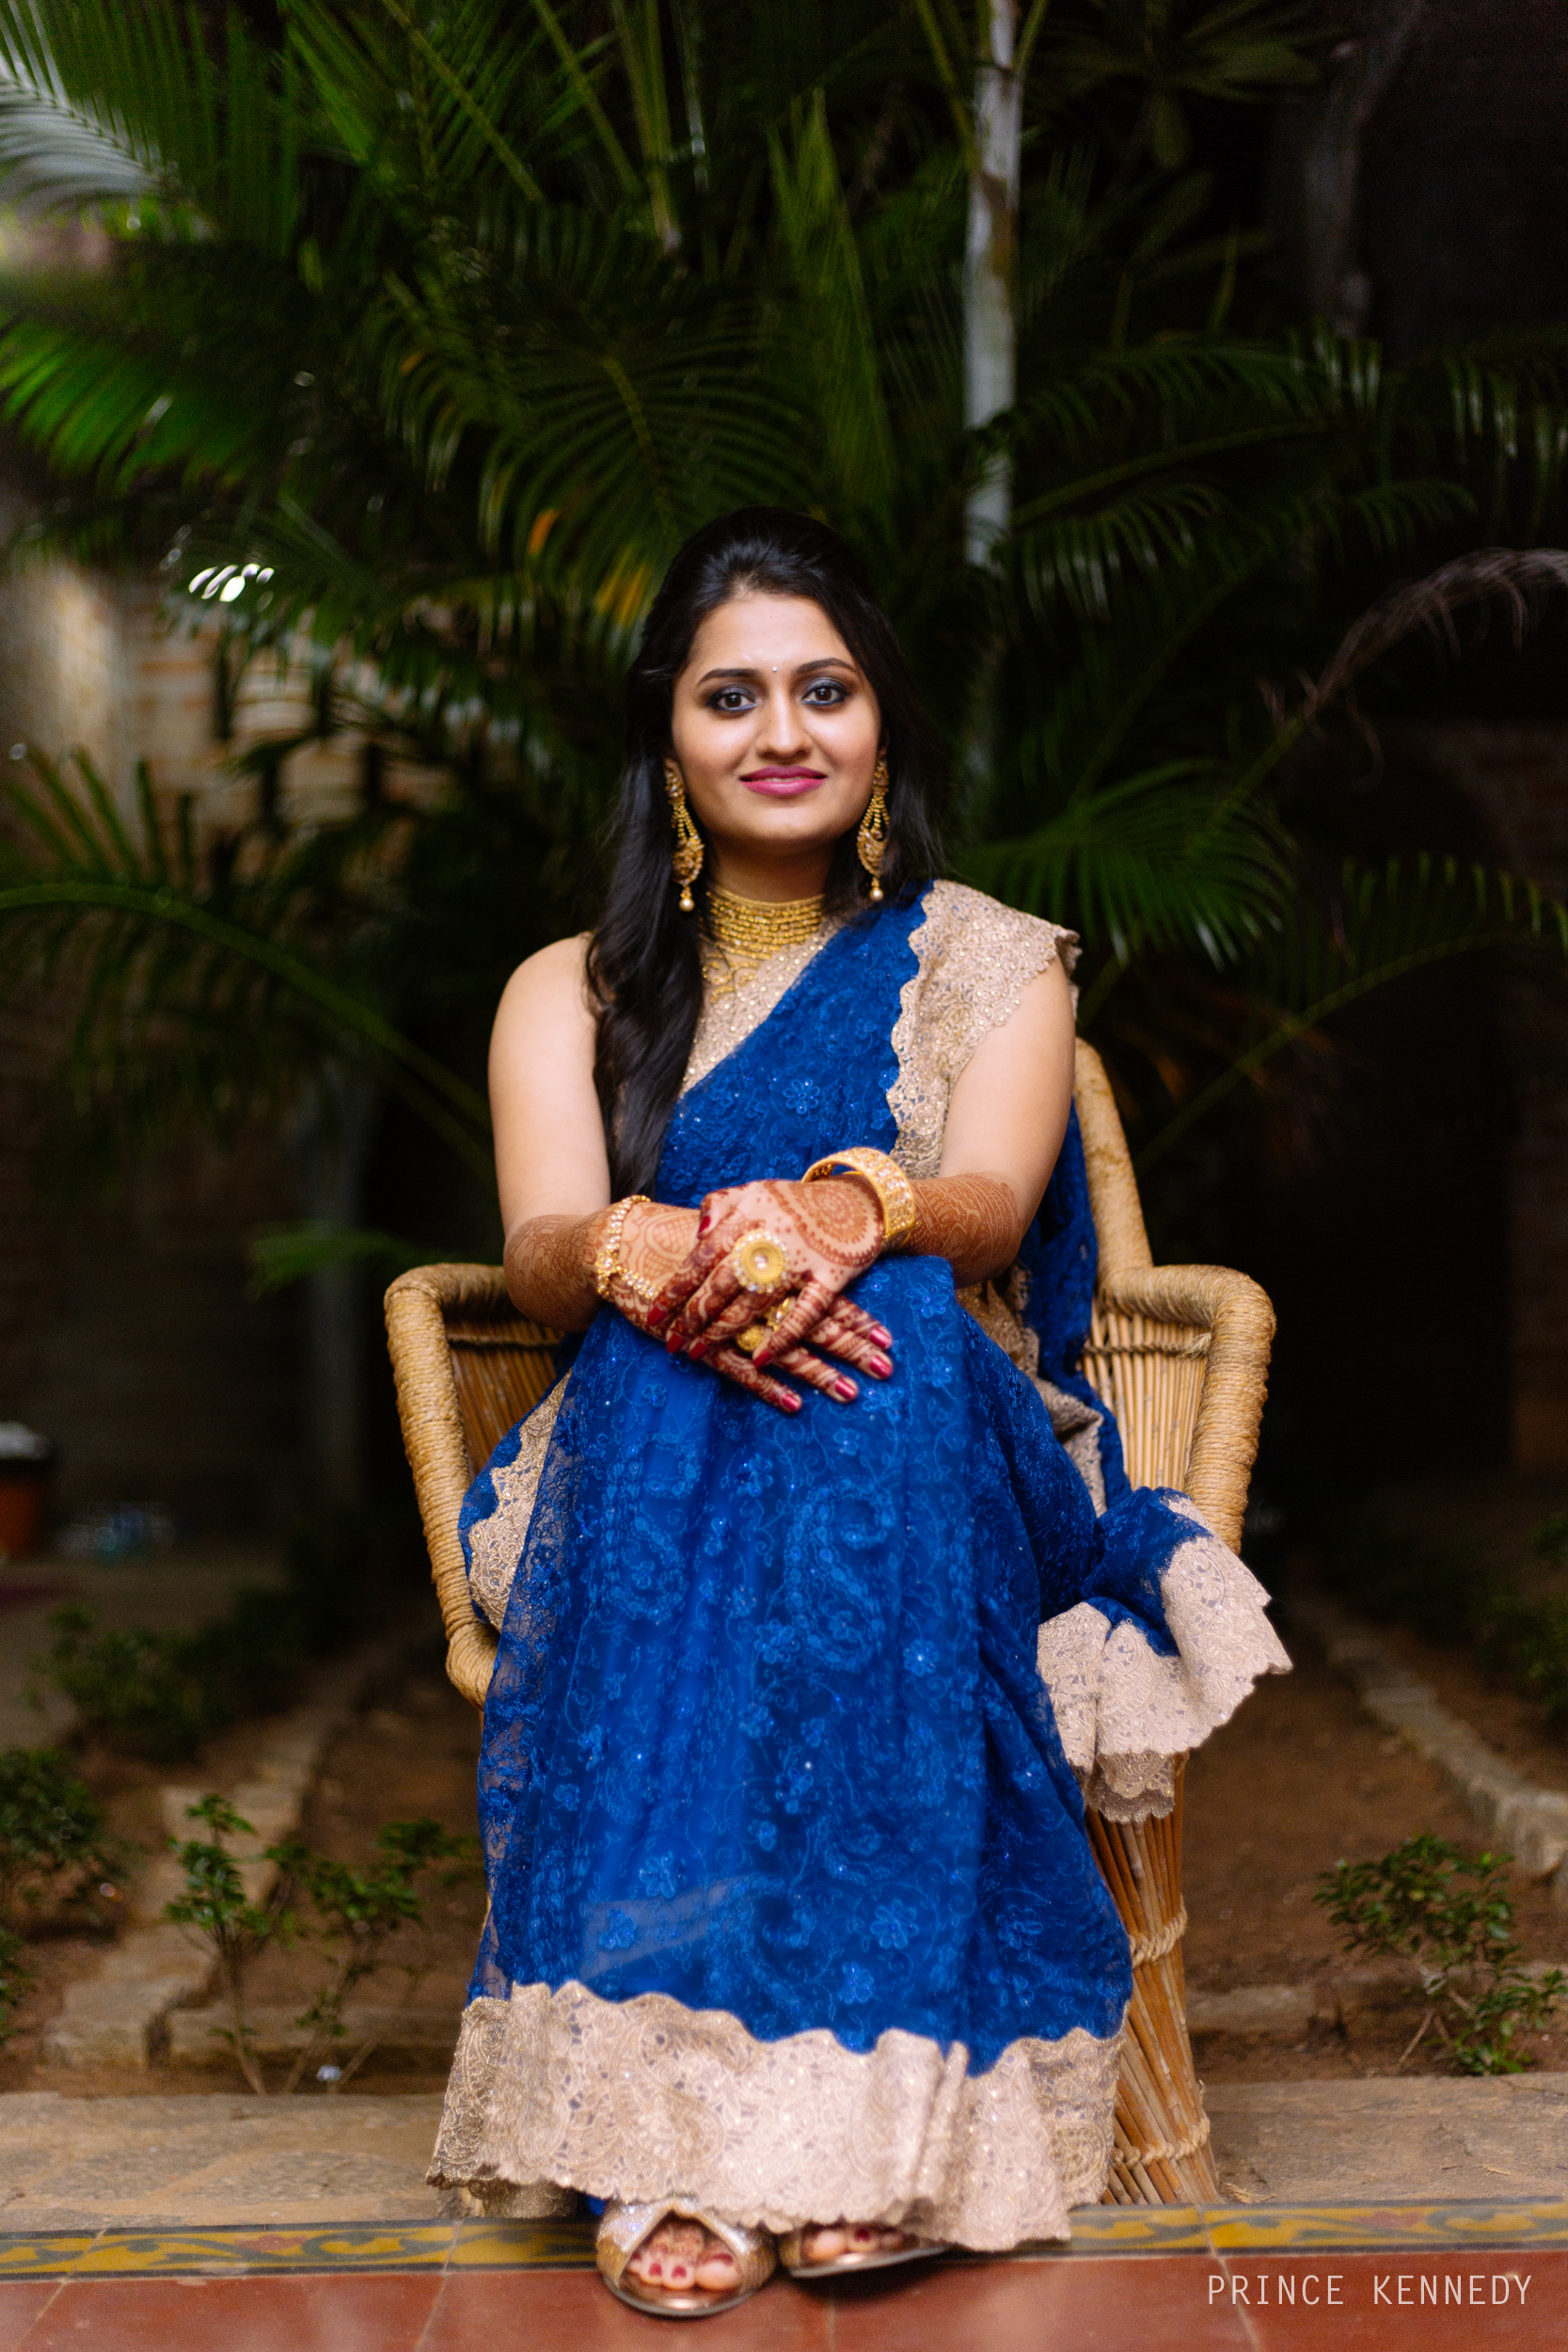 Athmajja-Nithesh-Engagement-Couple-Portrait-Portraiture-Wedding-Couple-Portrait-Chennai-Photographer-Candid-Photography-Destination-Best-Prince-Kennedy-Photography-43.jpg